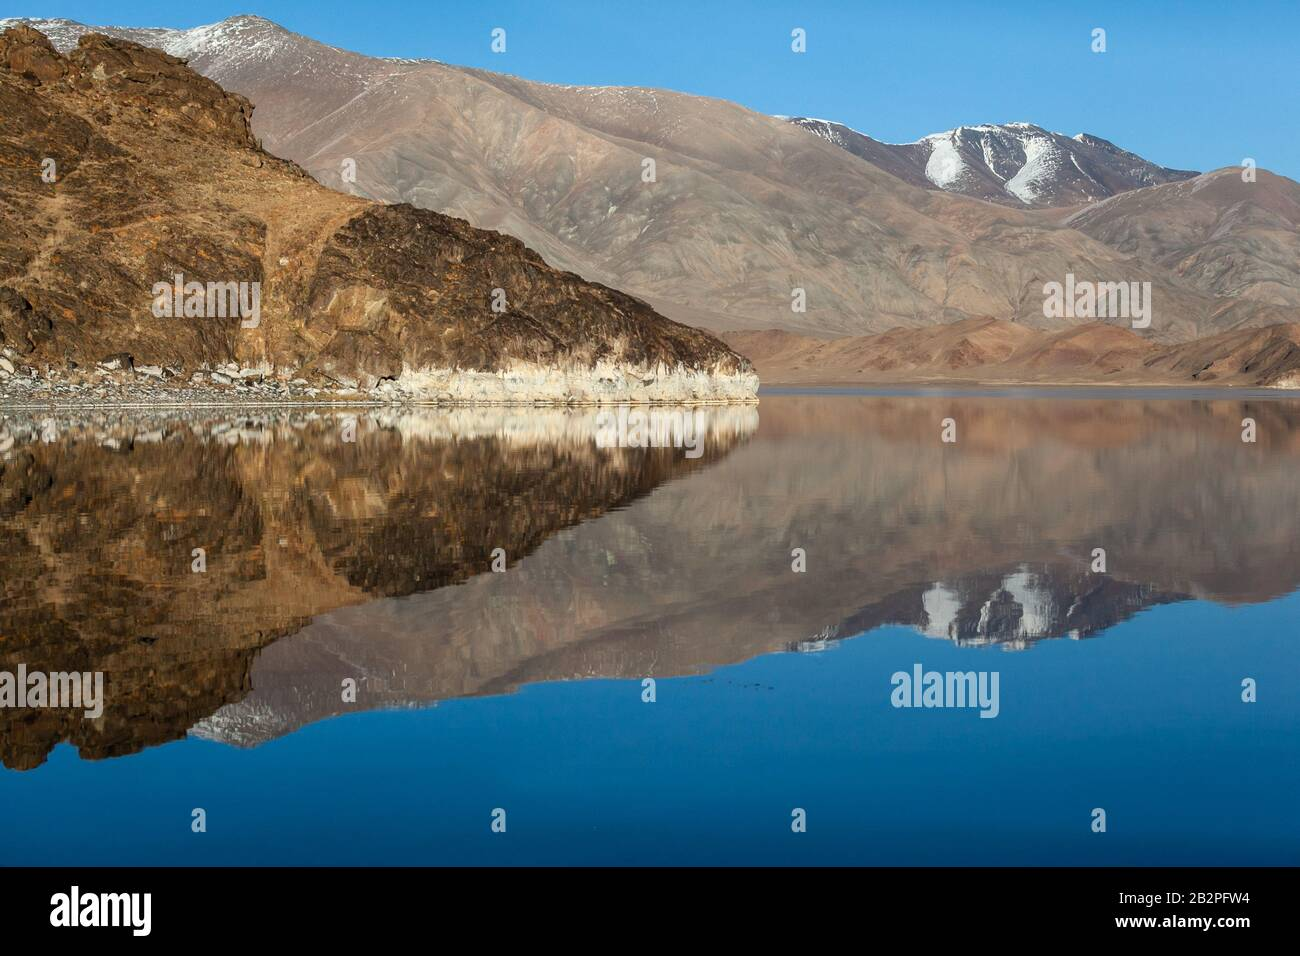 Mirror reflection in calm lake. morning light. Western Mongolia Stock Photo